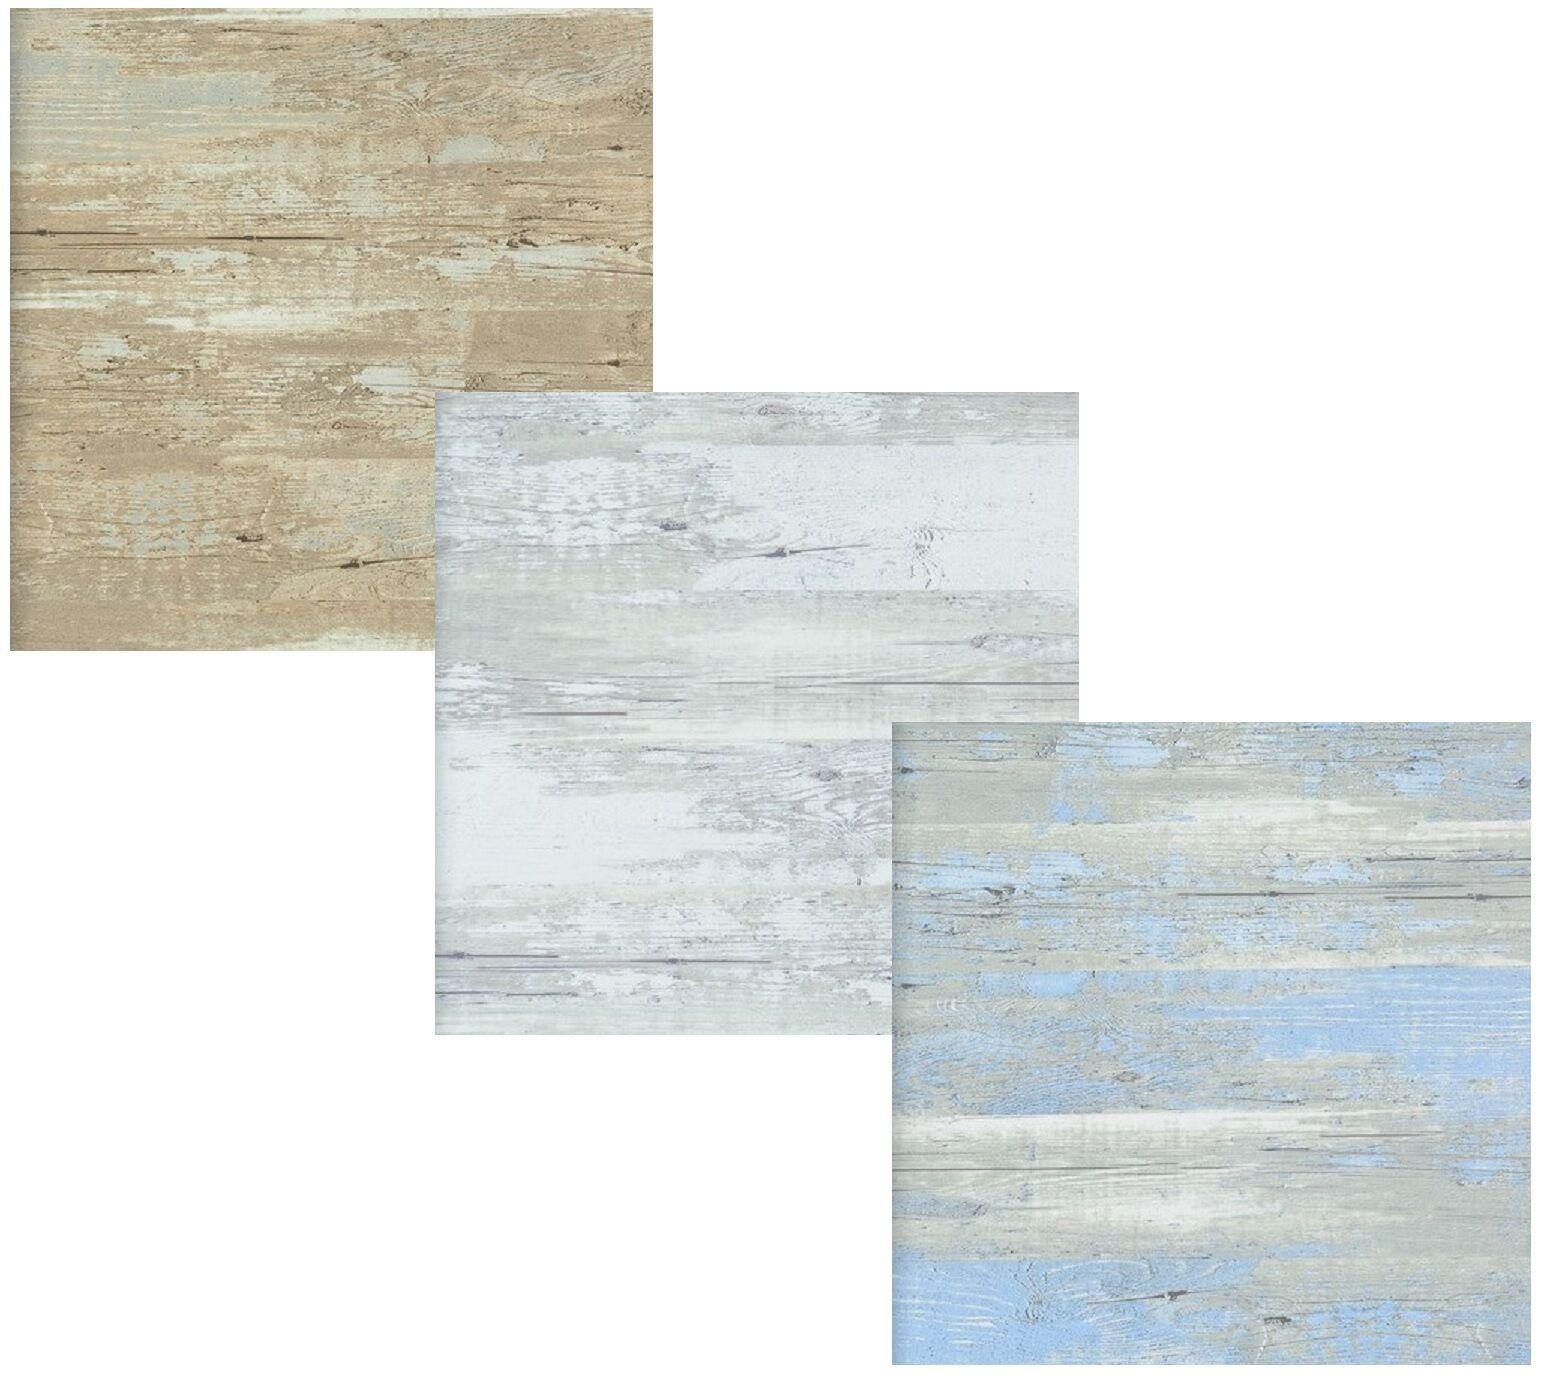 Vlies Tapete Antik Holz Rustikal Braun Grau Blau Weiss Bretter